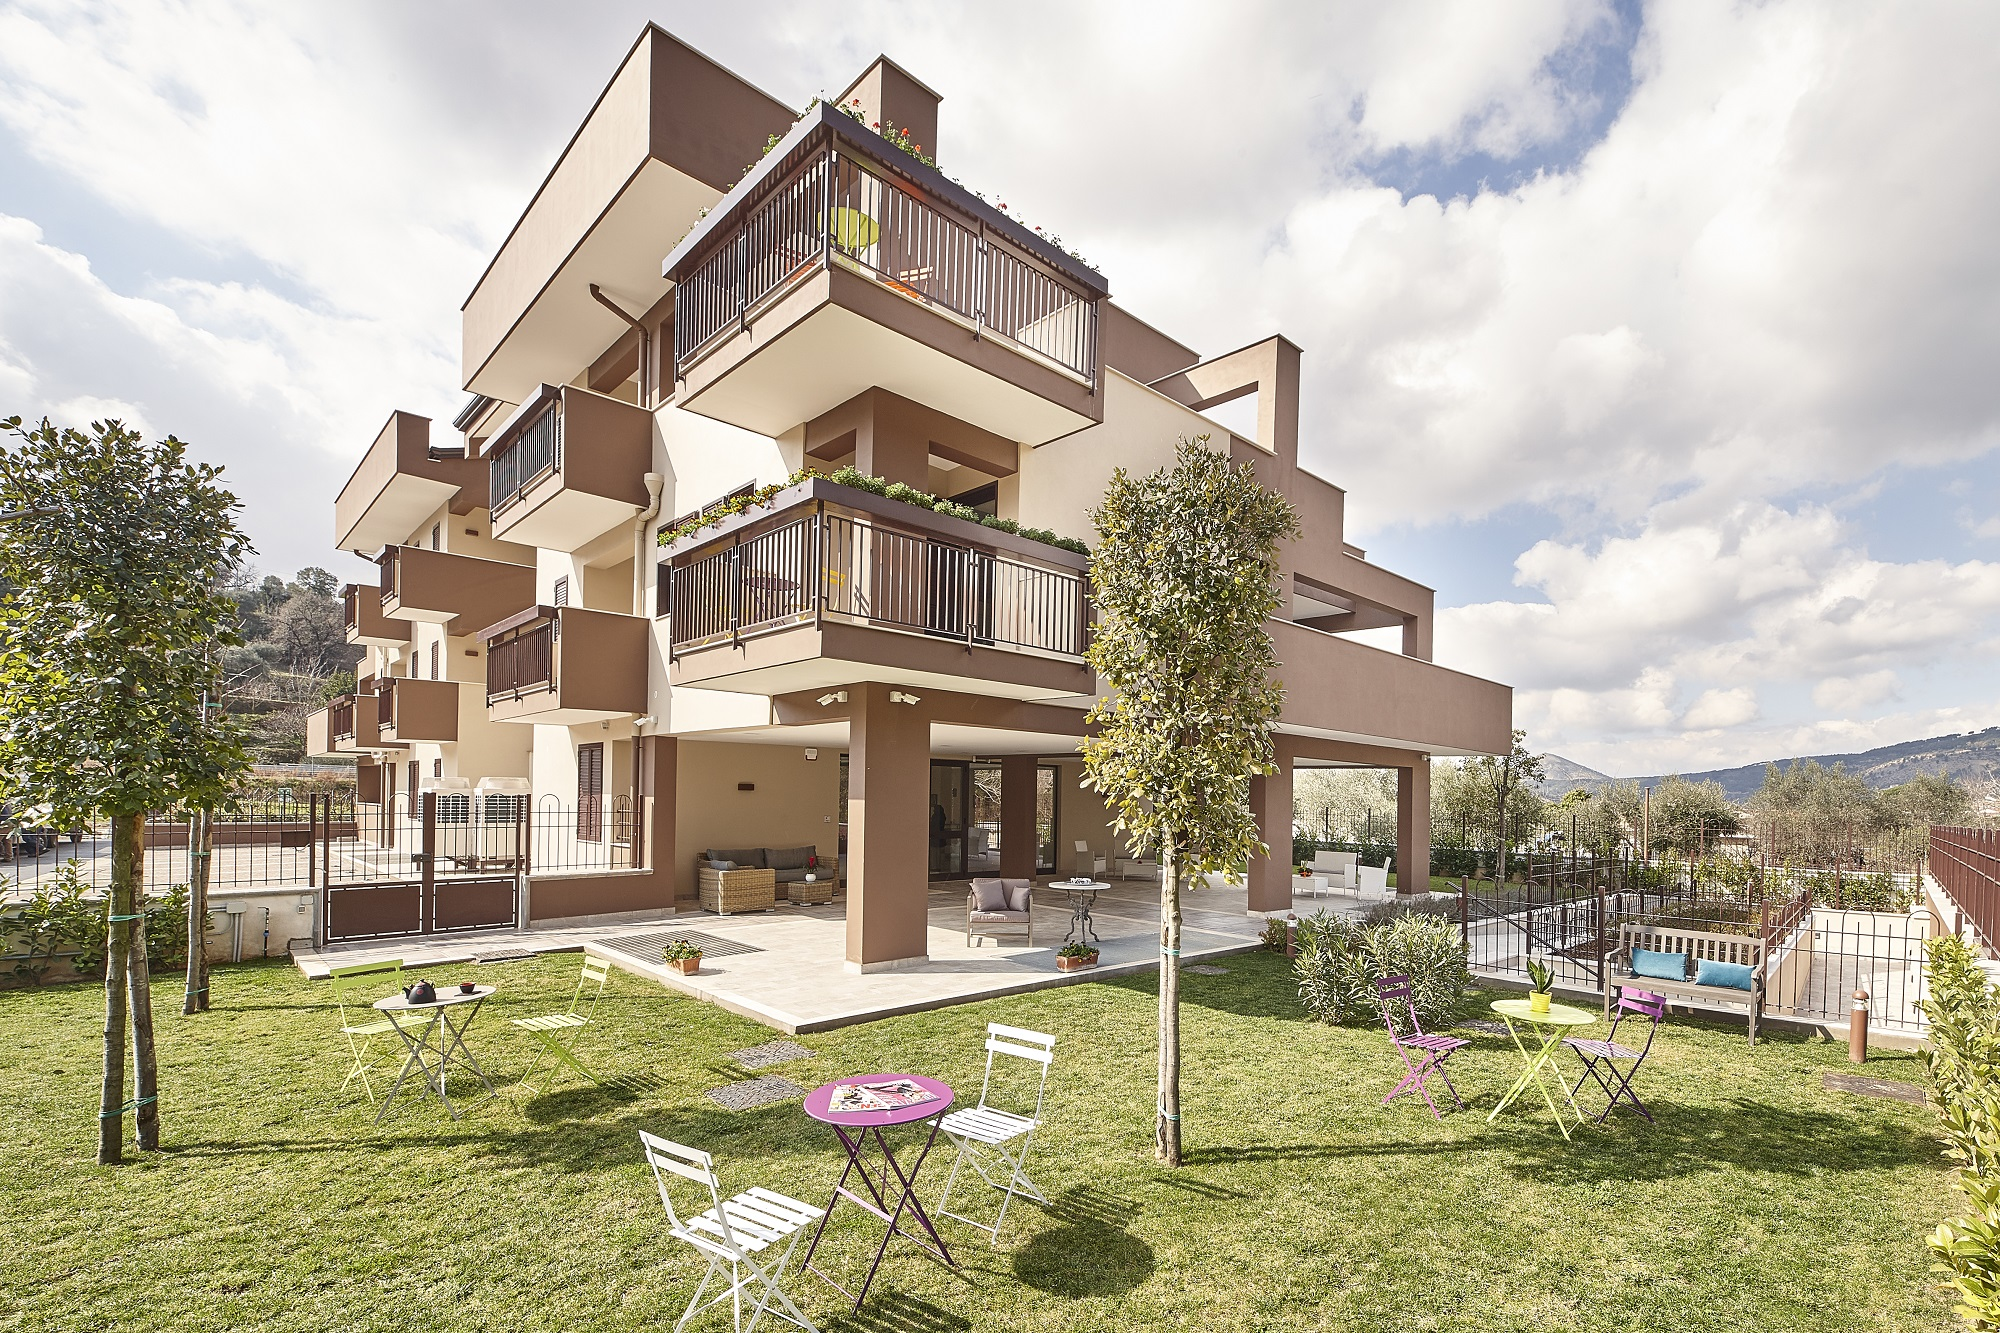 Villa Oscar, casa per anziani